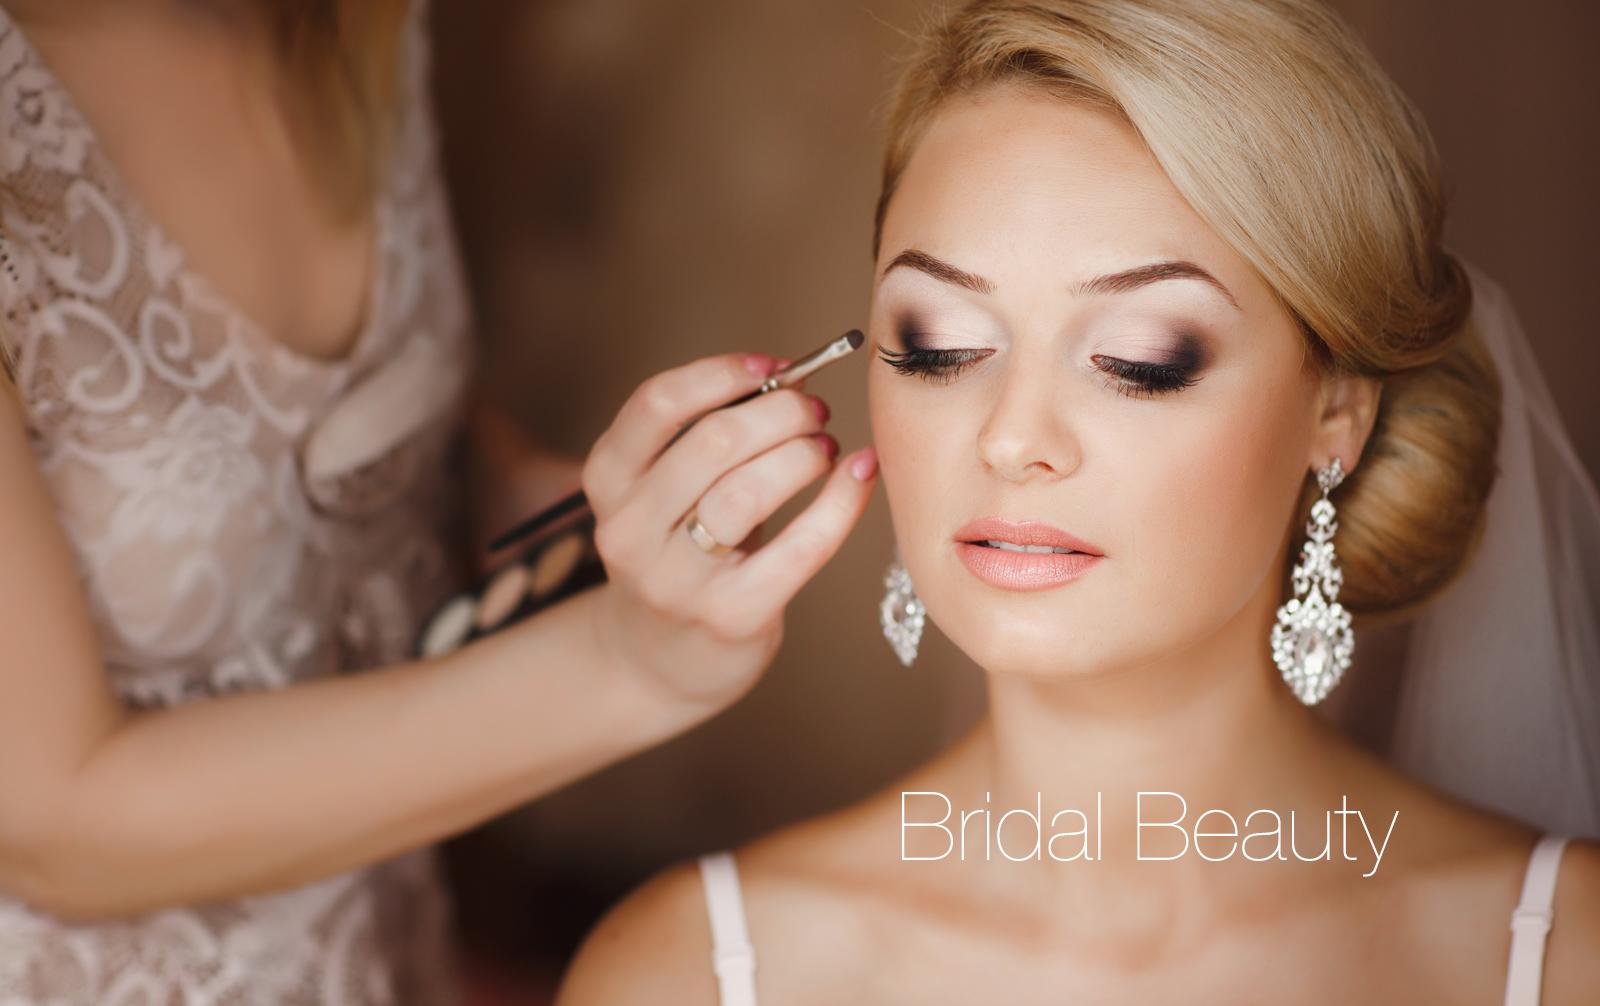 MainRotator-TigerLily-Bridal-Beauty